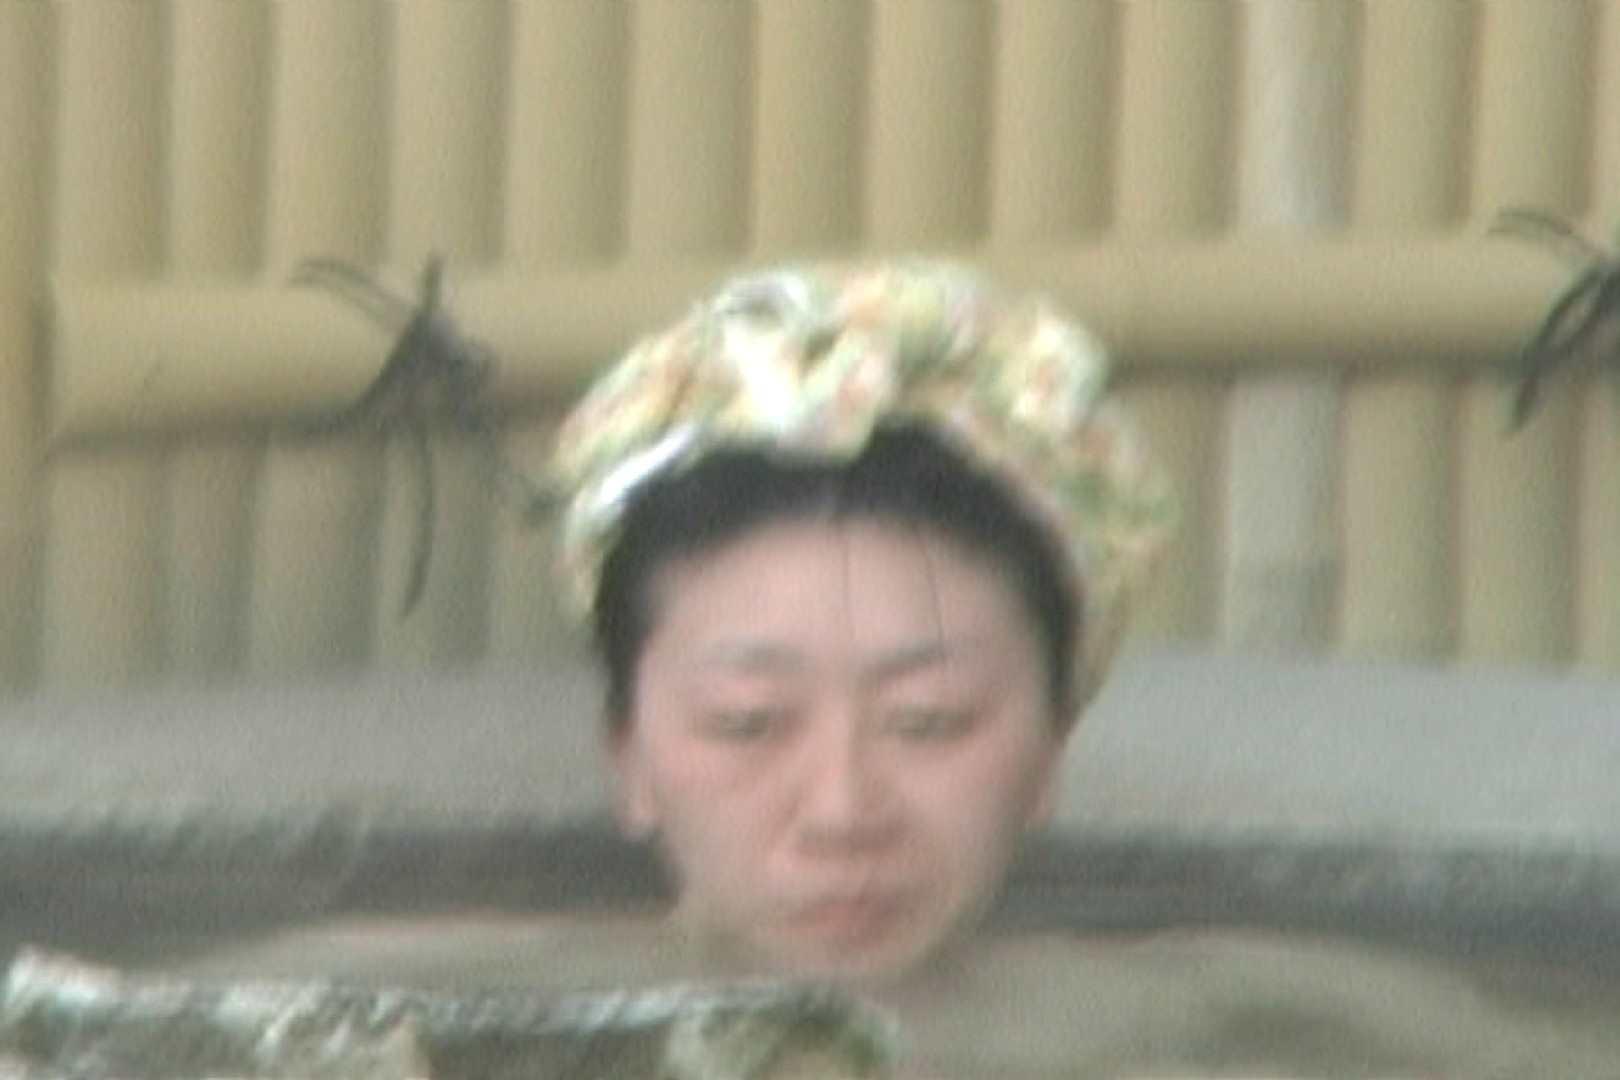 Aquaな露天風呂Vol.594 盗撮師作品 | 露天風呂突入  79pic 40